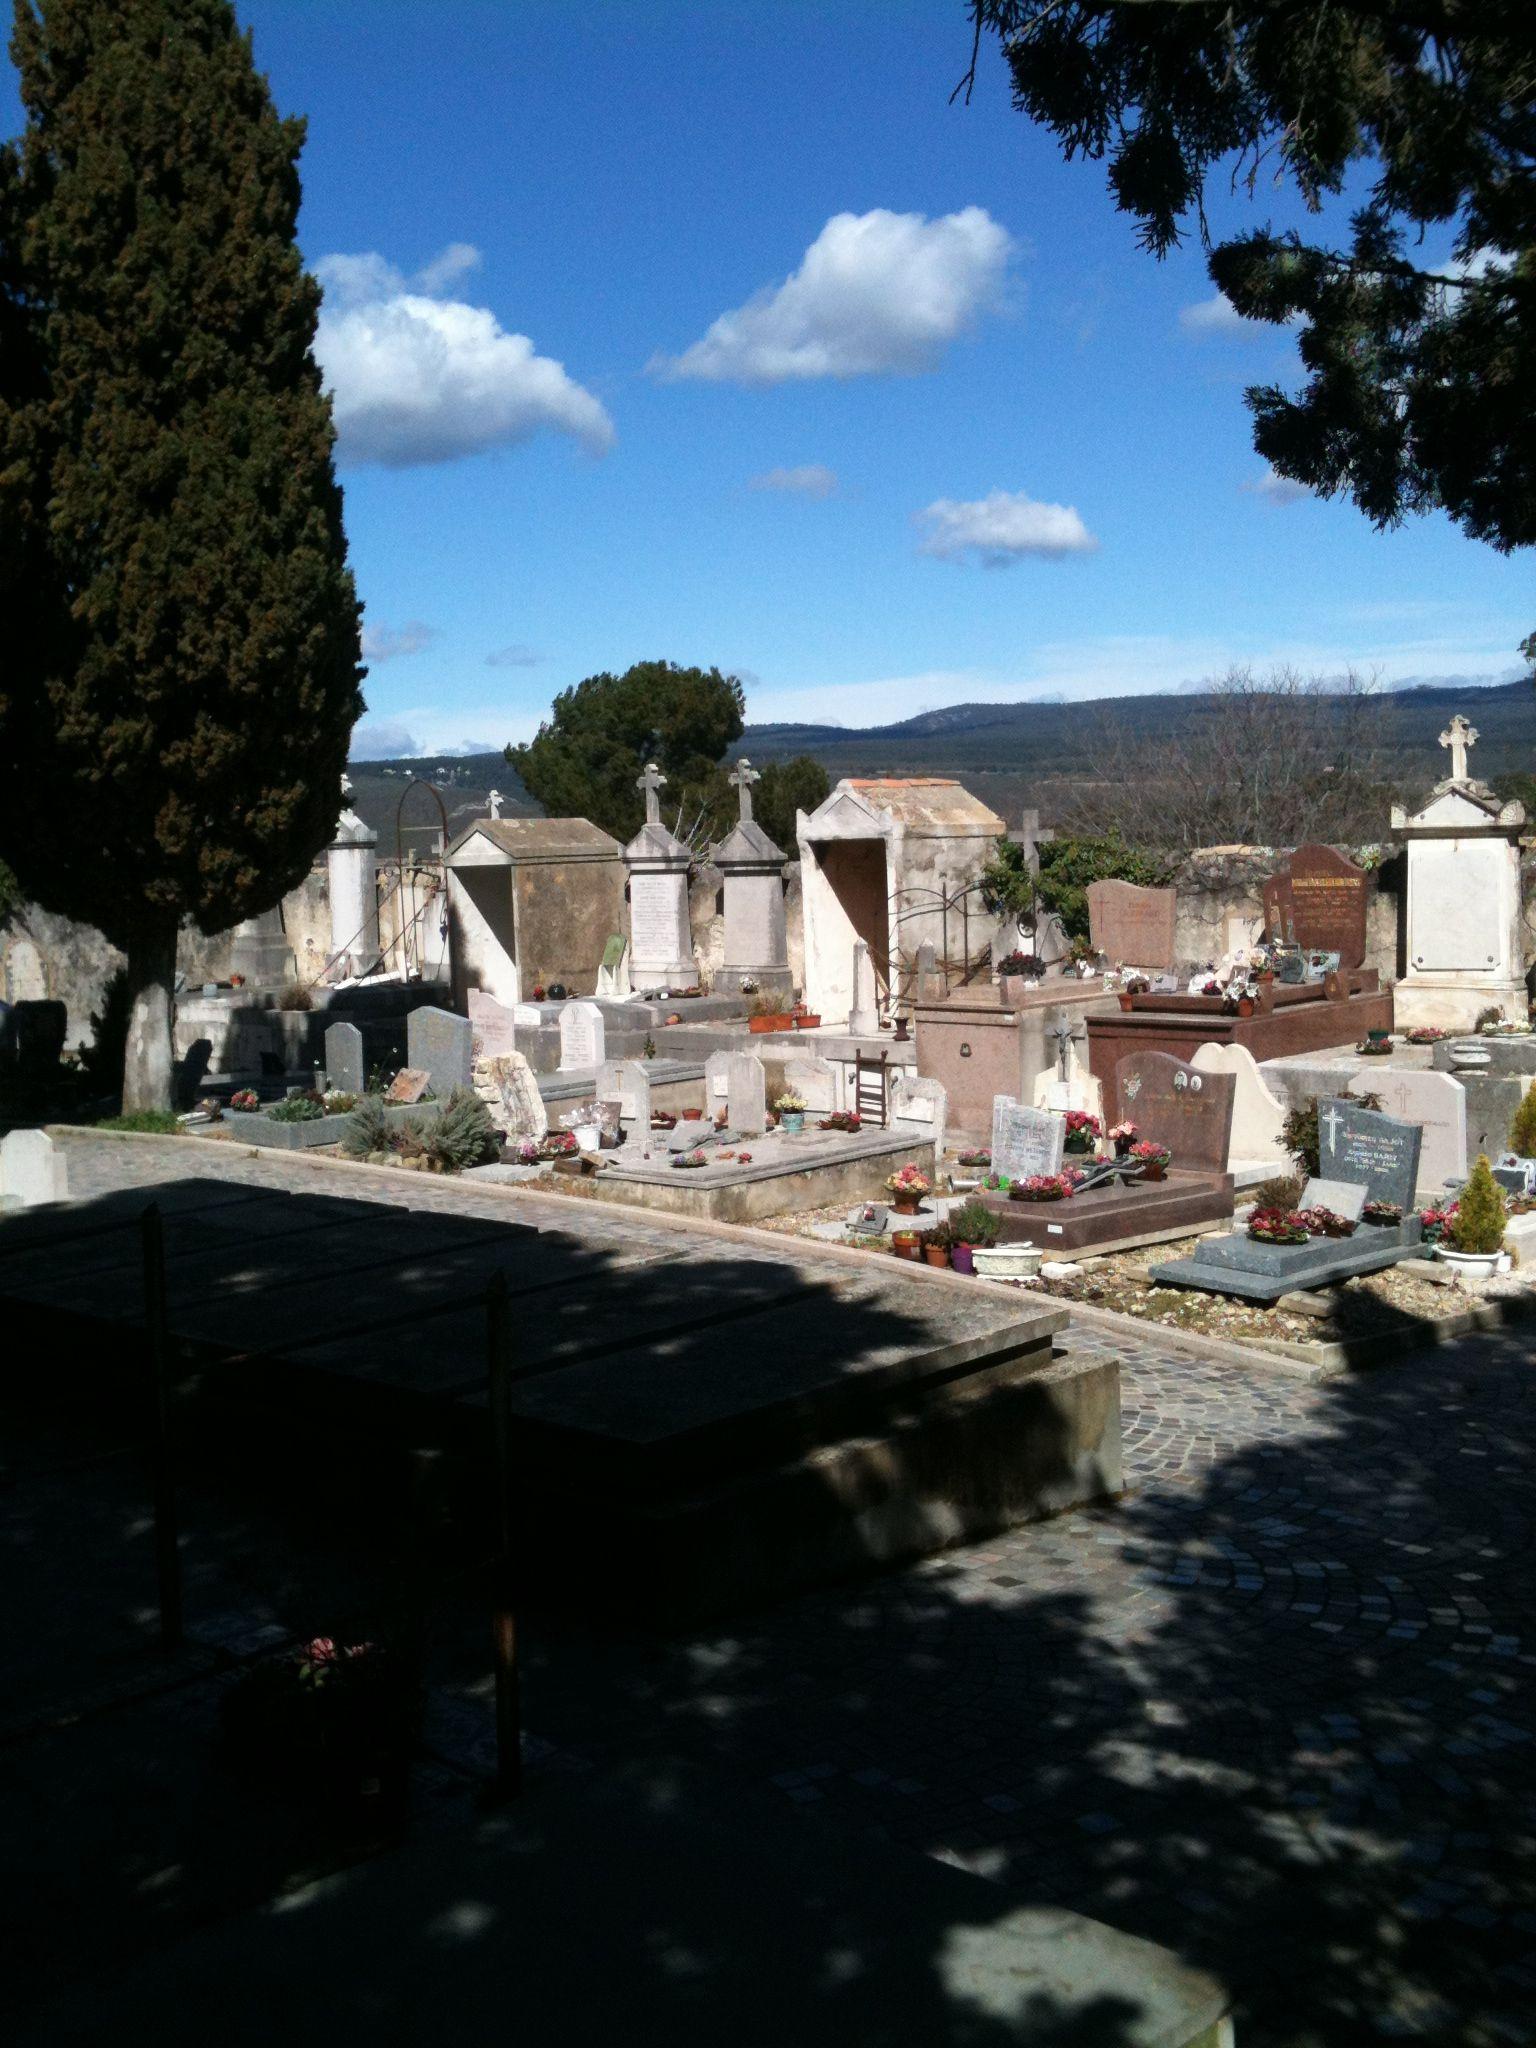 Cementerio de Castellet. Francia